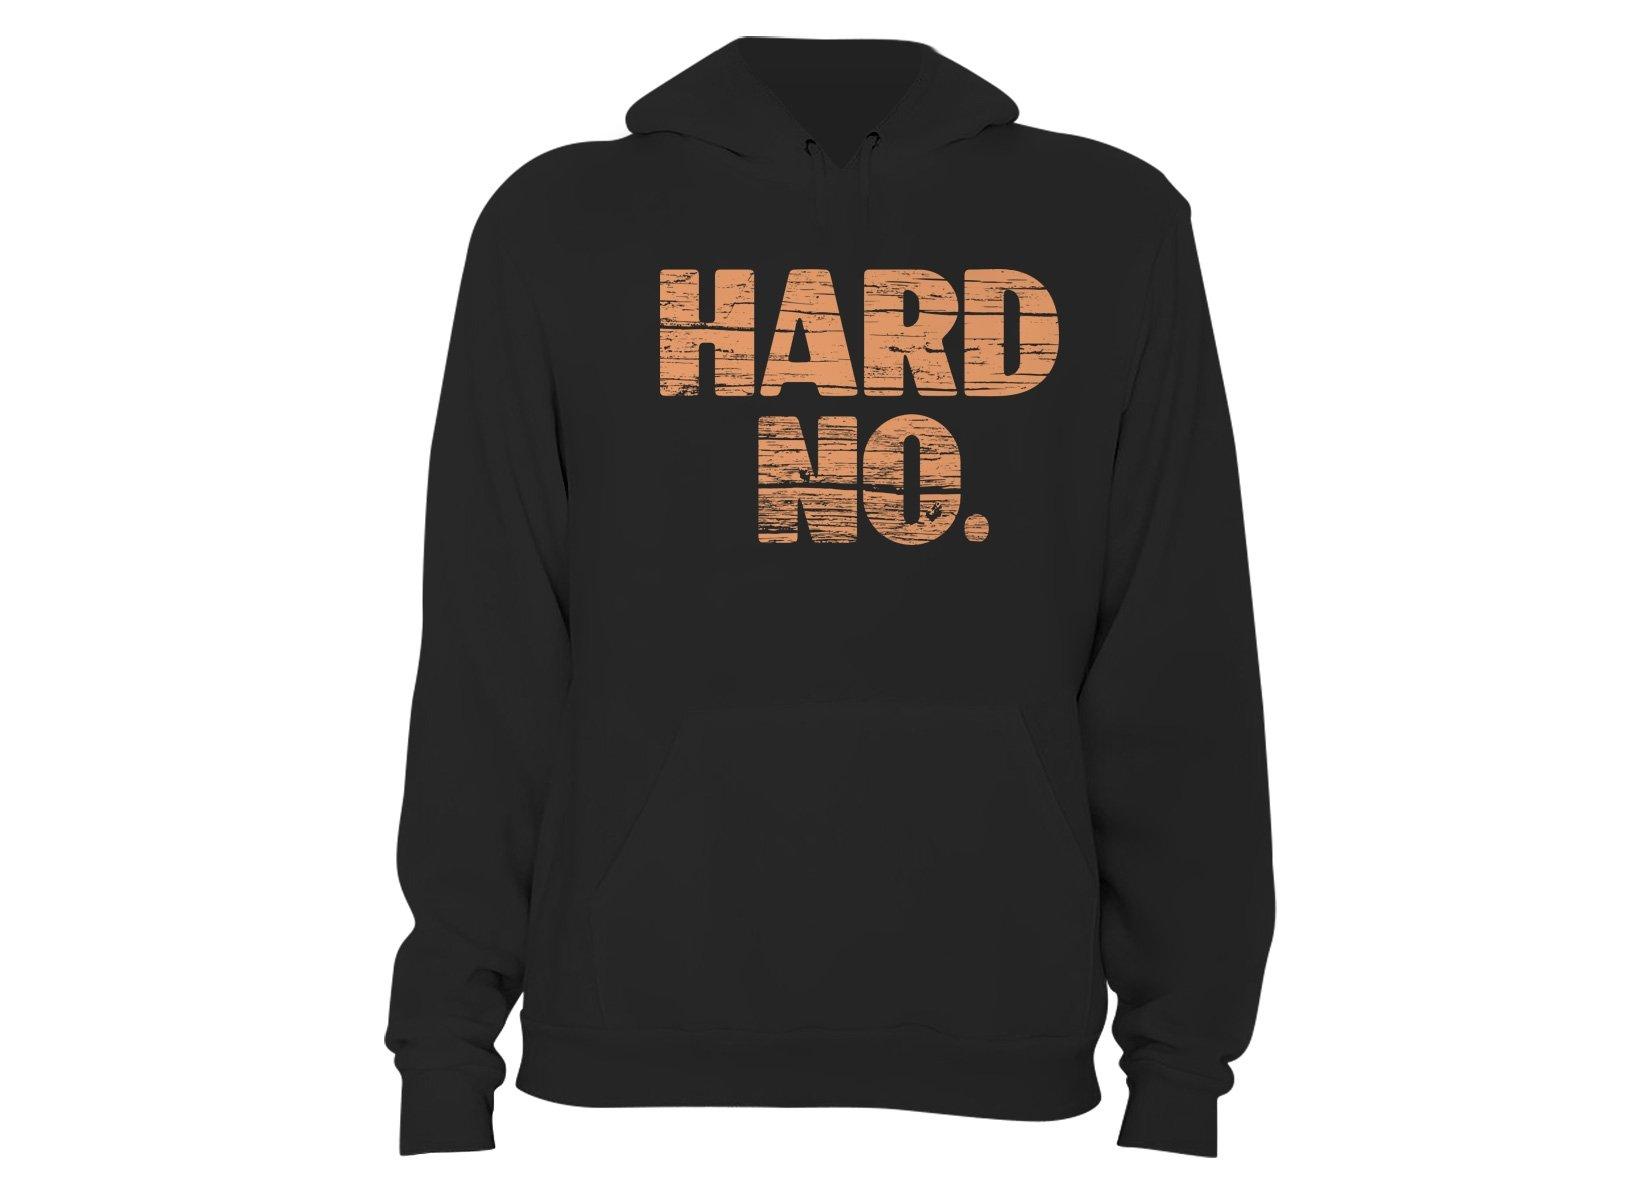 Hard No on Hoodie